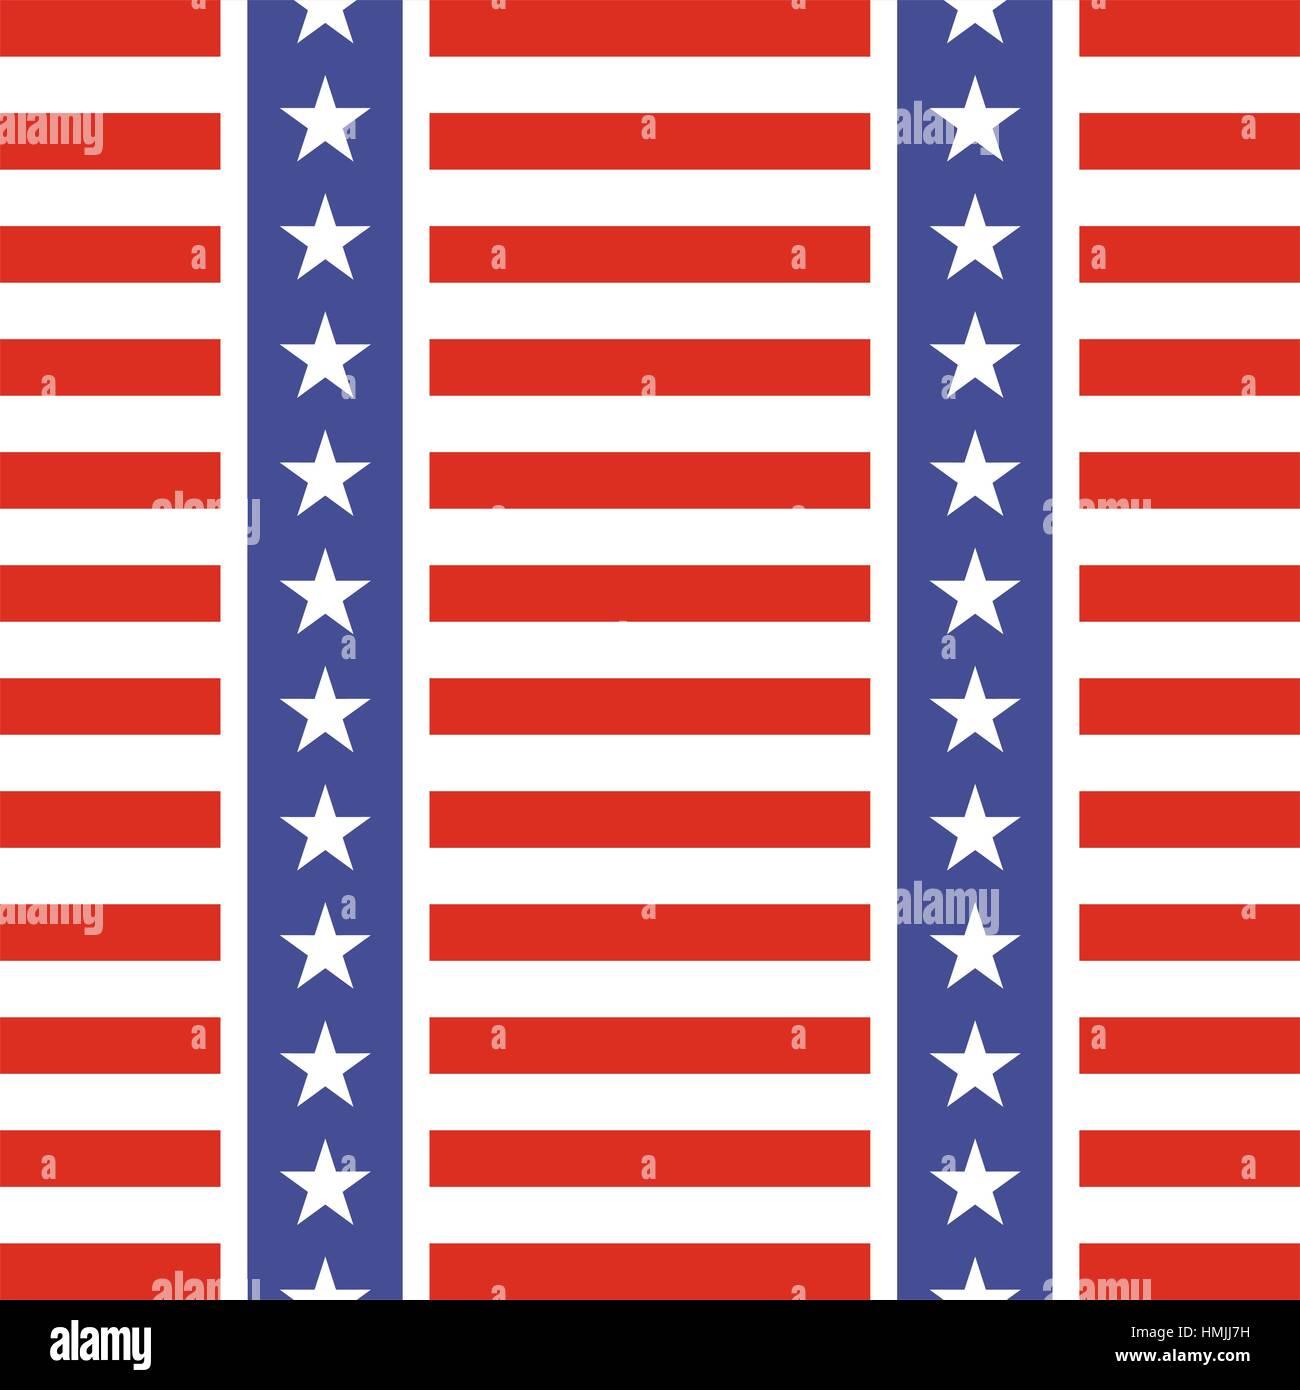 Patriotic Usa Seamless Pattern American Flag Symbols And